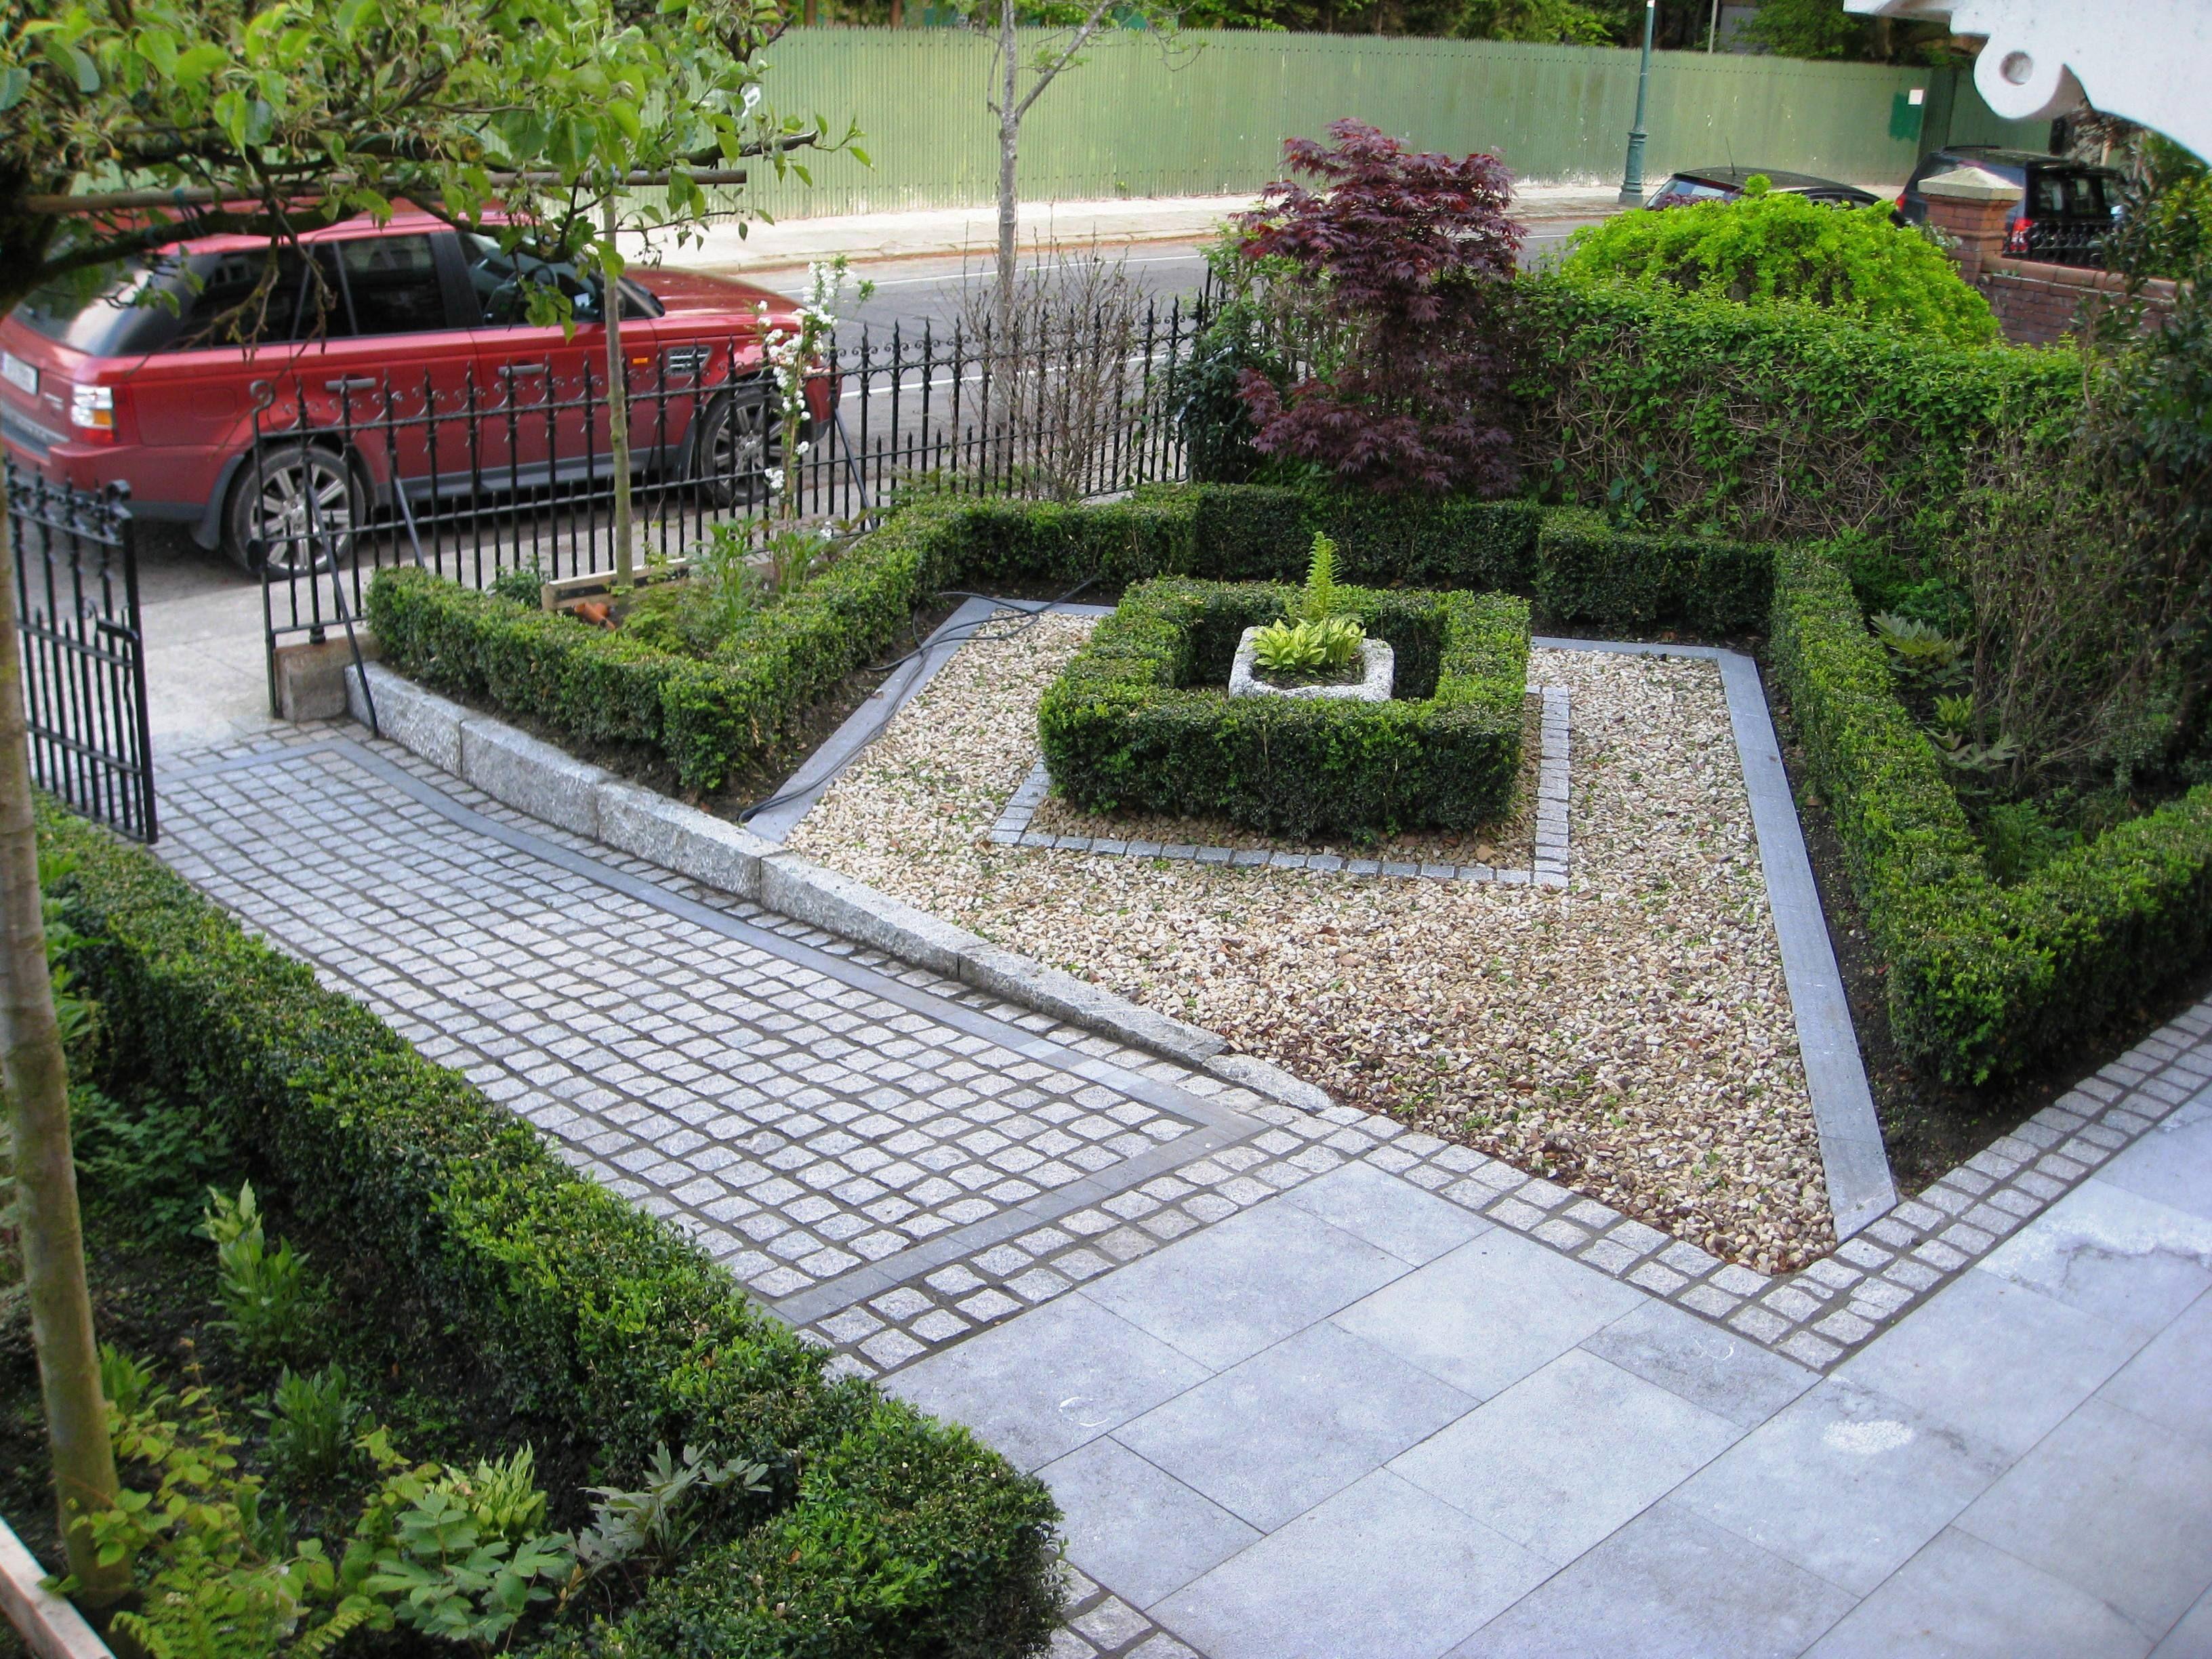 Bathroom Design Software Mac Home Design Software For Pc And Mac Interior Design And Onlin Front Yard Garden Design Front Garden Design Small Front Gardens